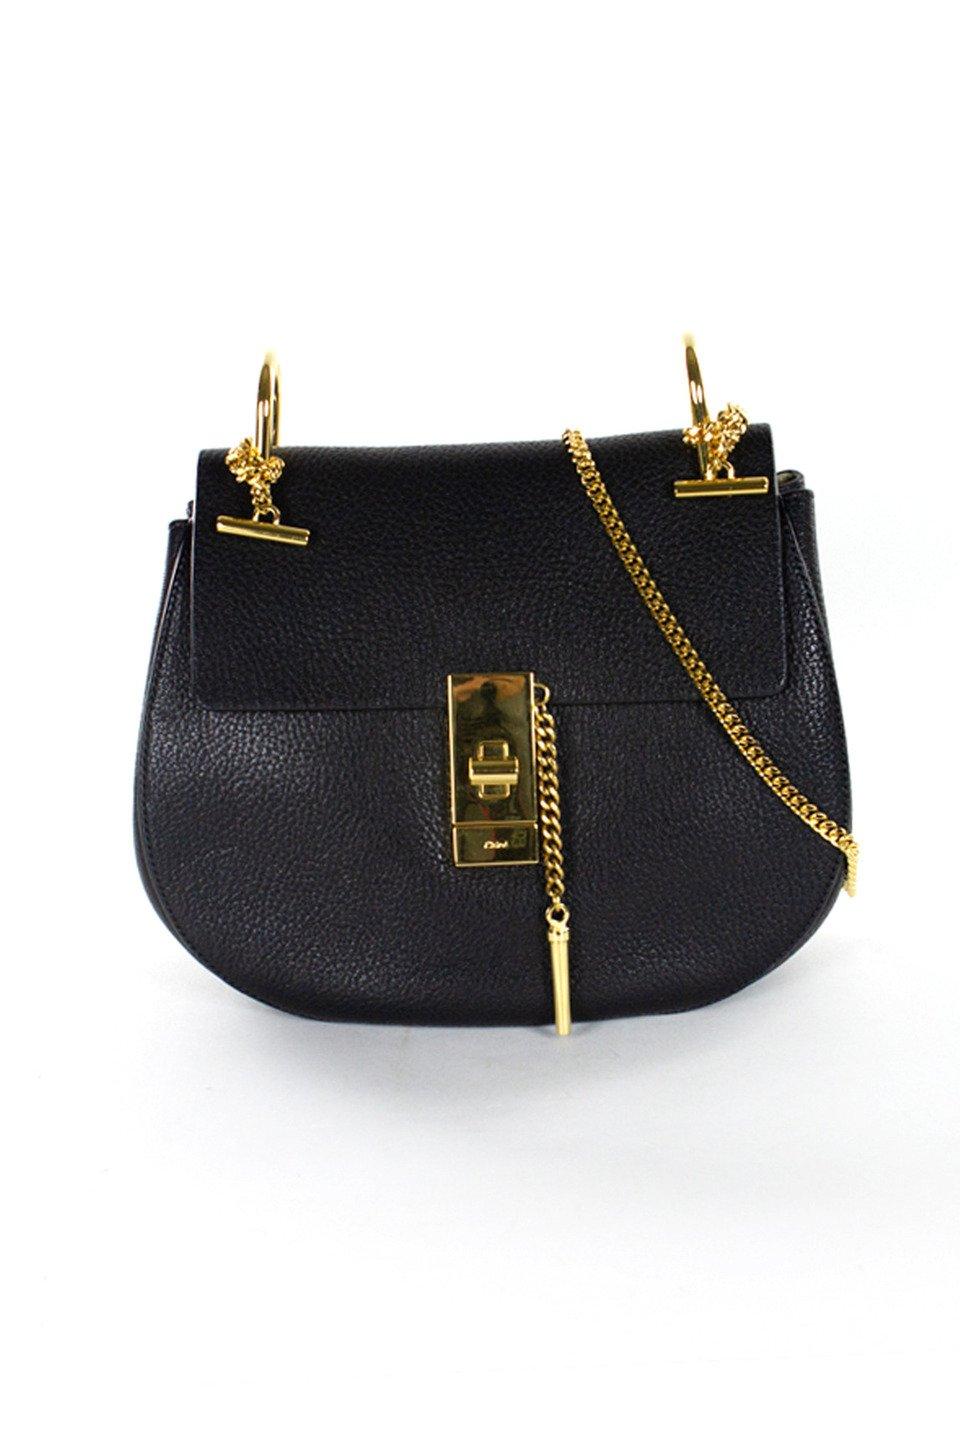 Chloe Leather Handbag in Black